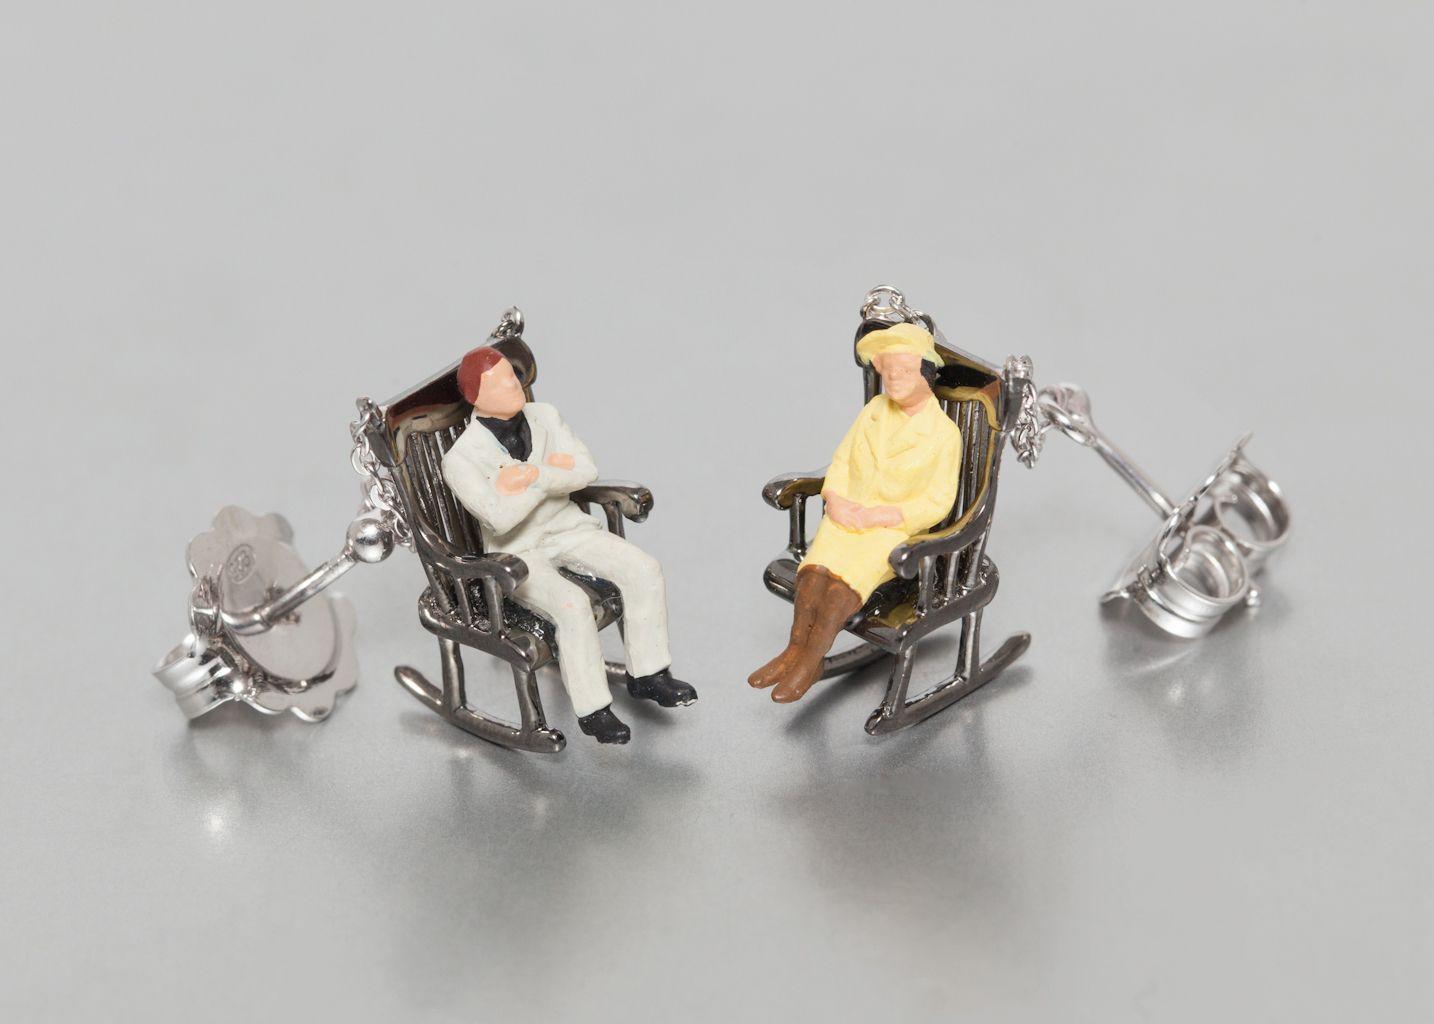 Boucles d'Oreilles Mini Personnages Spuntino - Miss Bibi